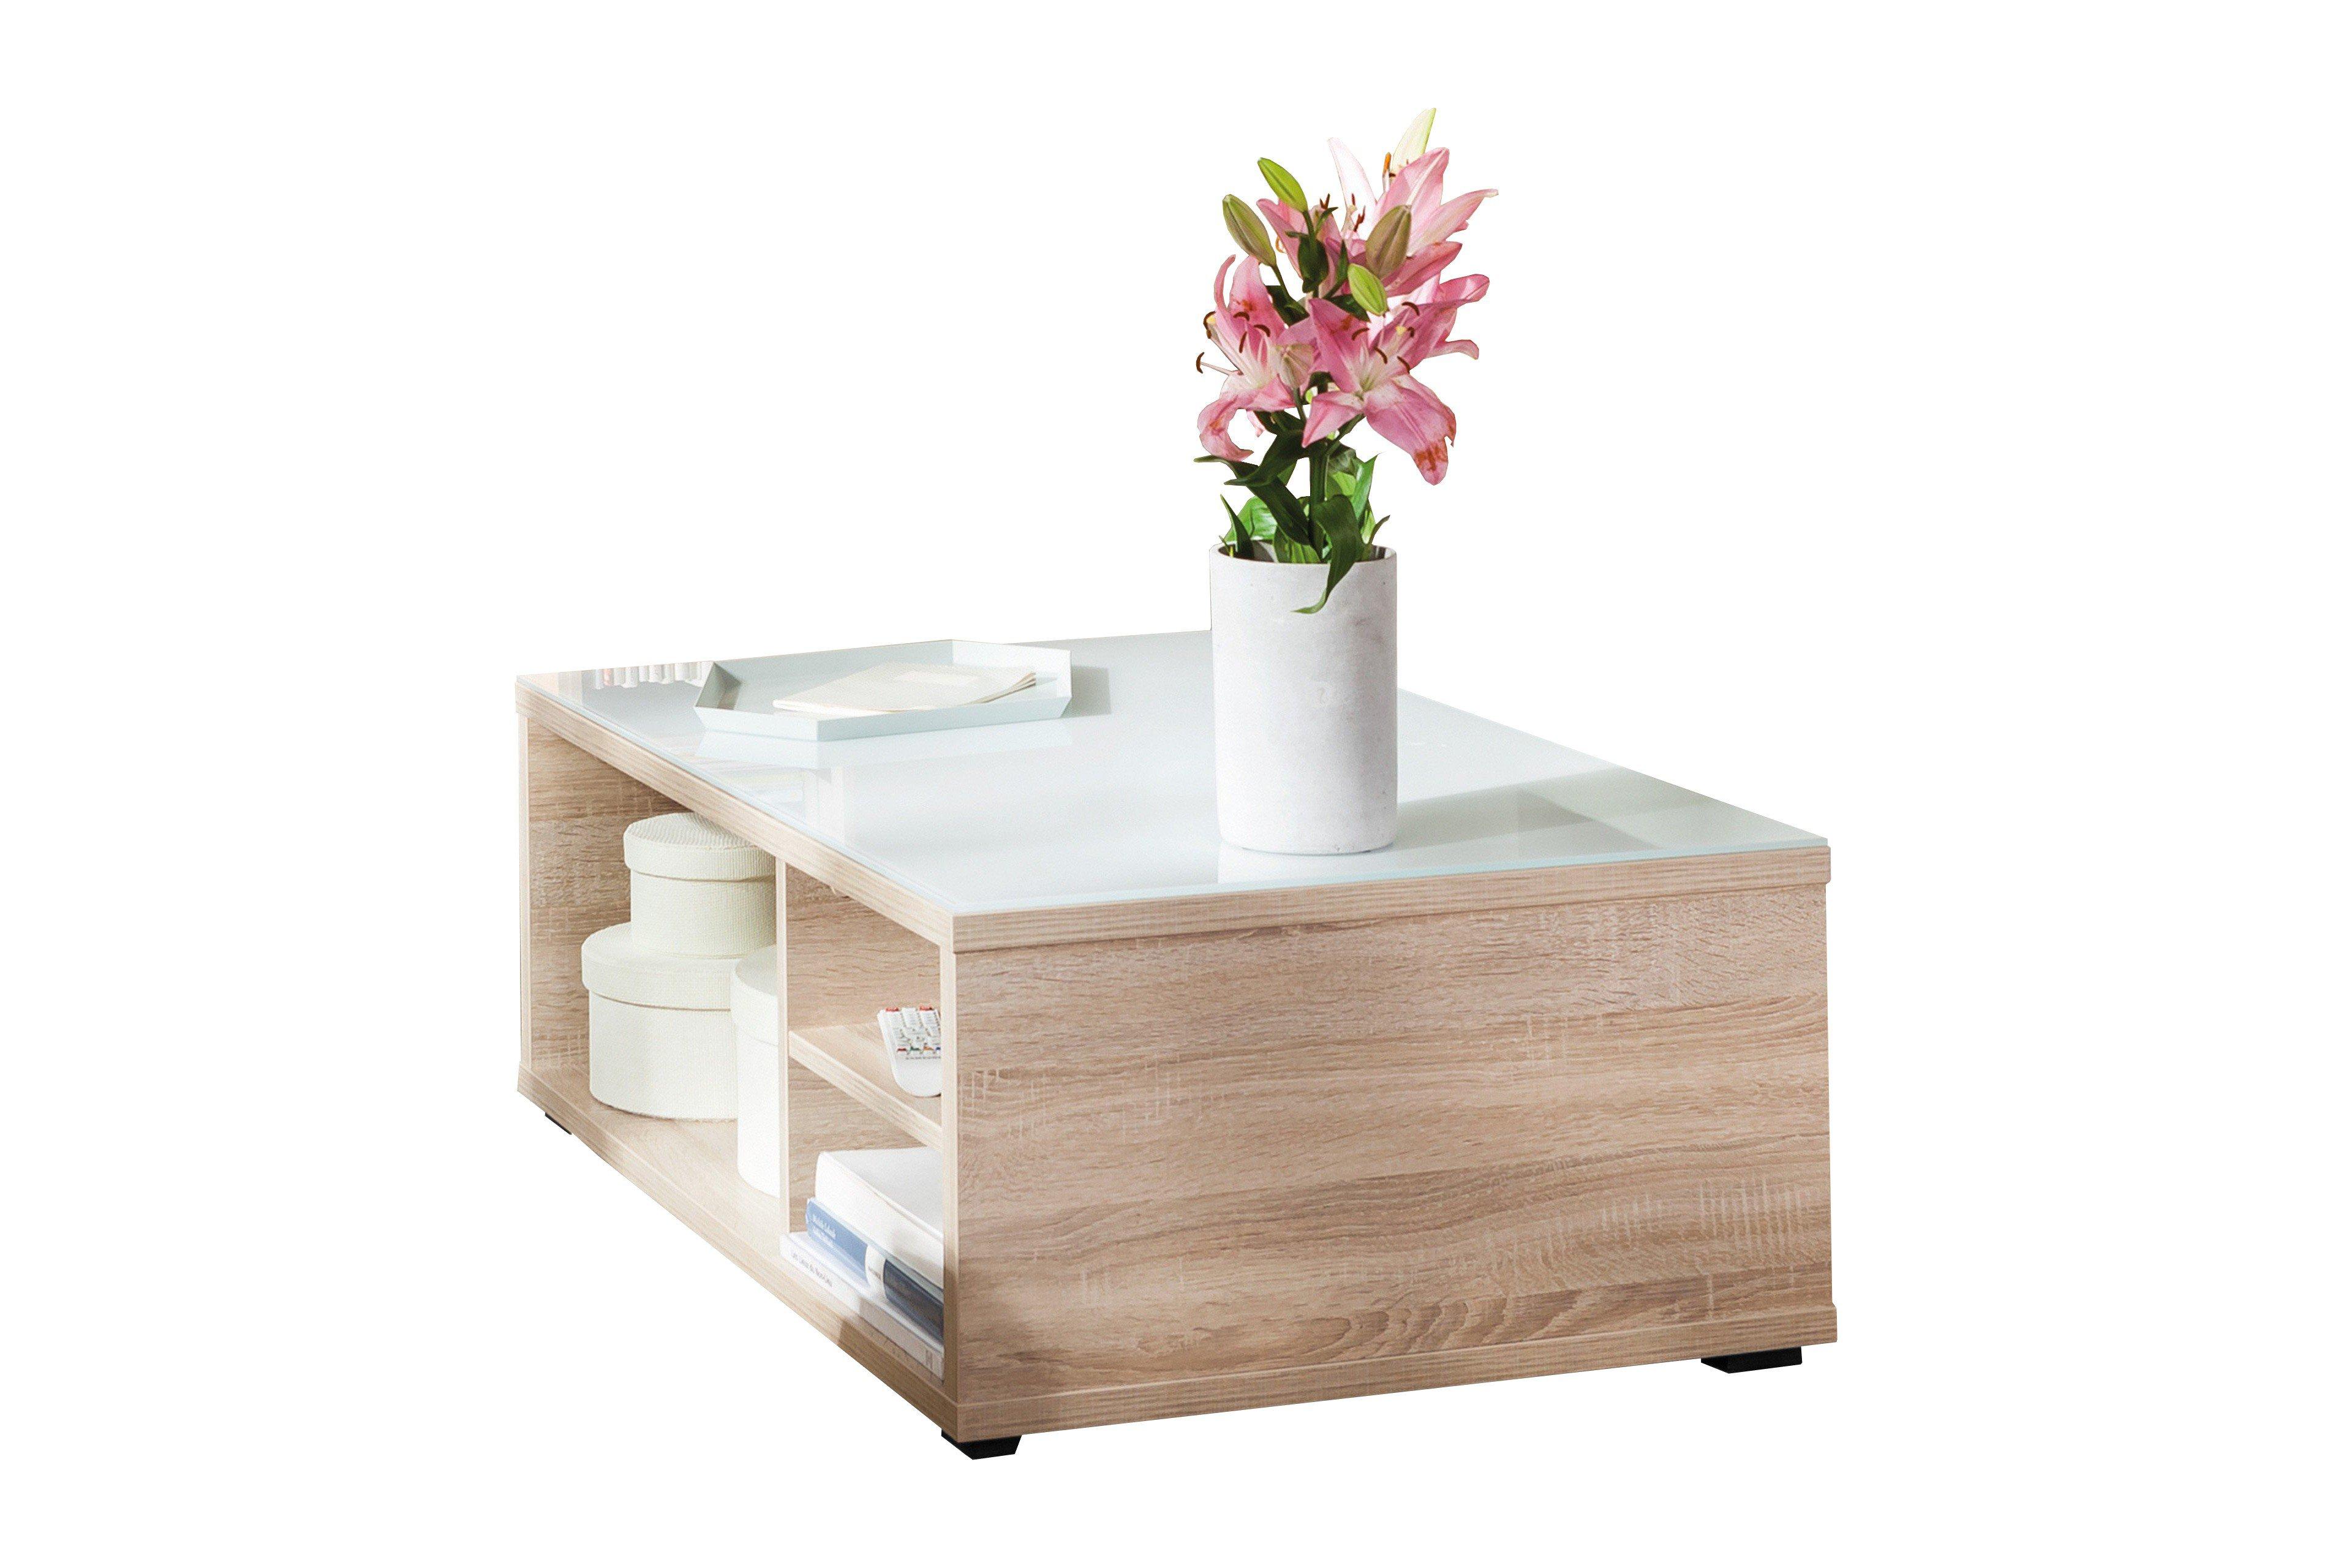 schmale couchtisch couchtisch brooklyn frau h lt. Black Bedroom Furniture Sets. Home Design Ideas